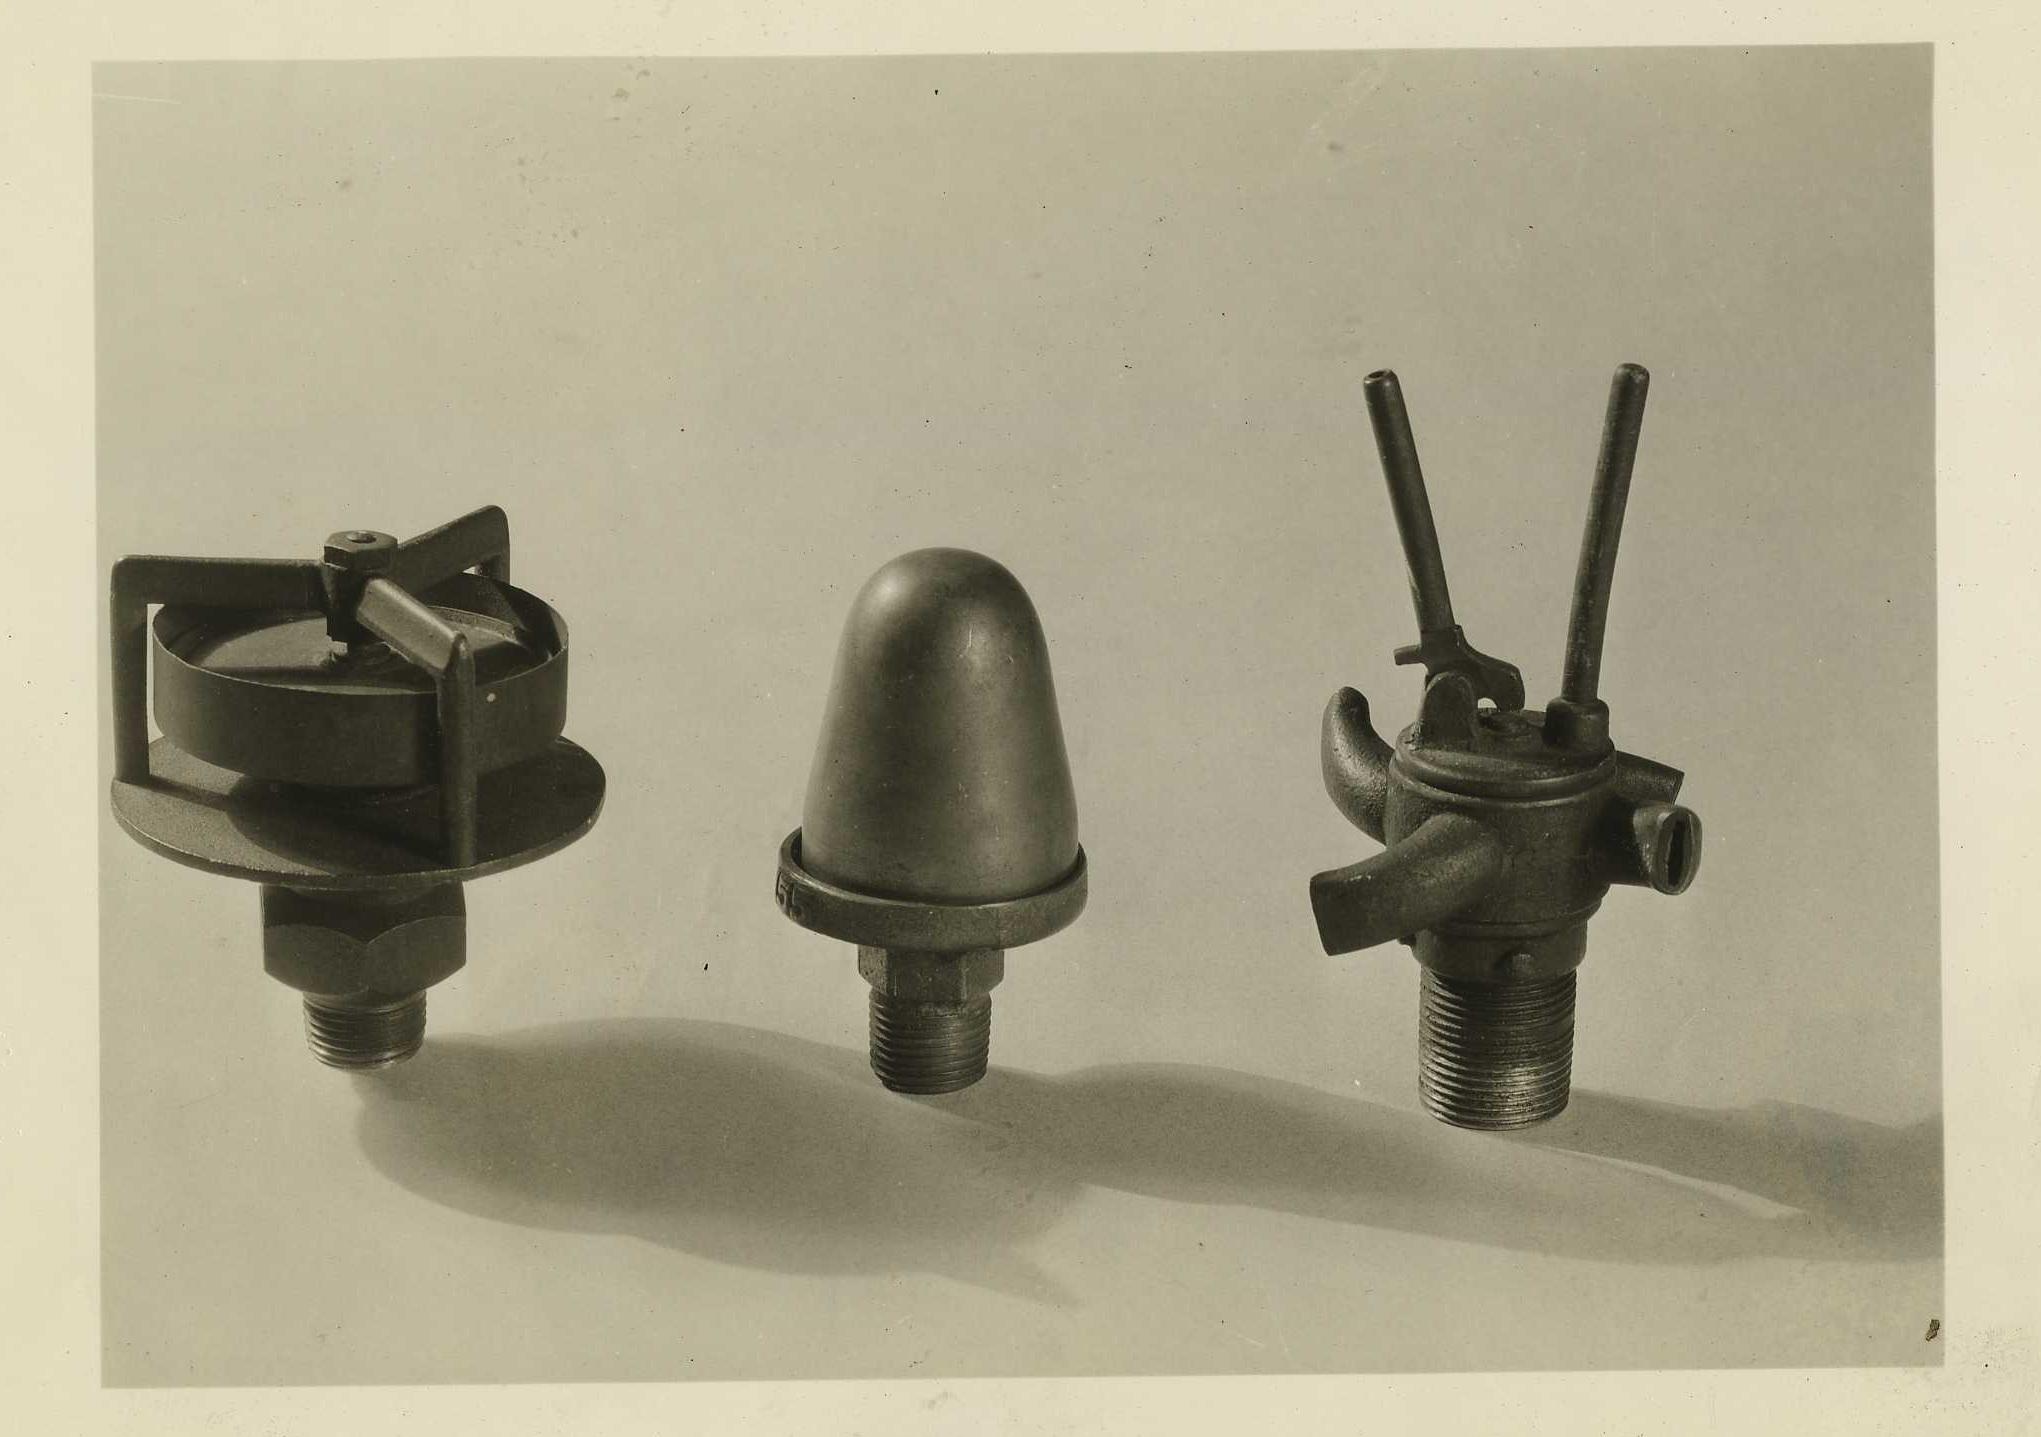 the history of sprinkler